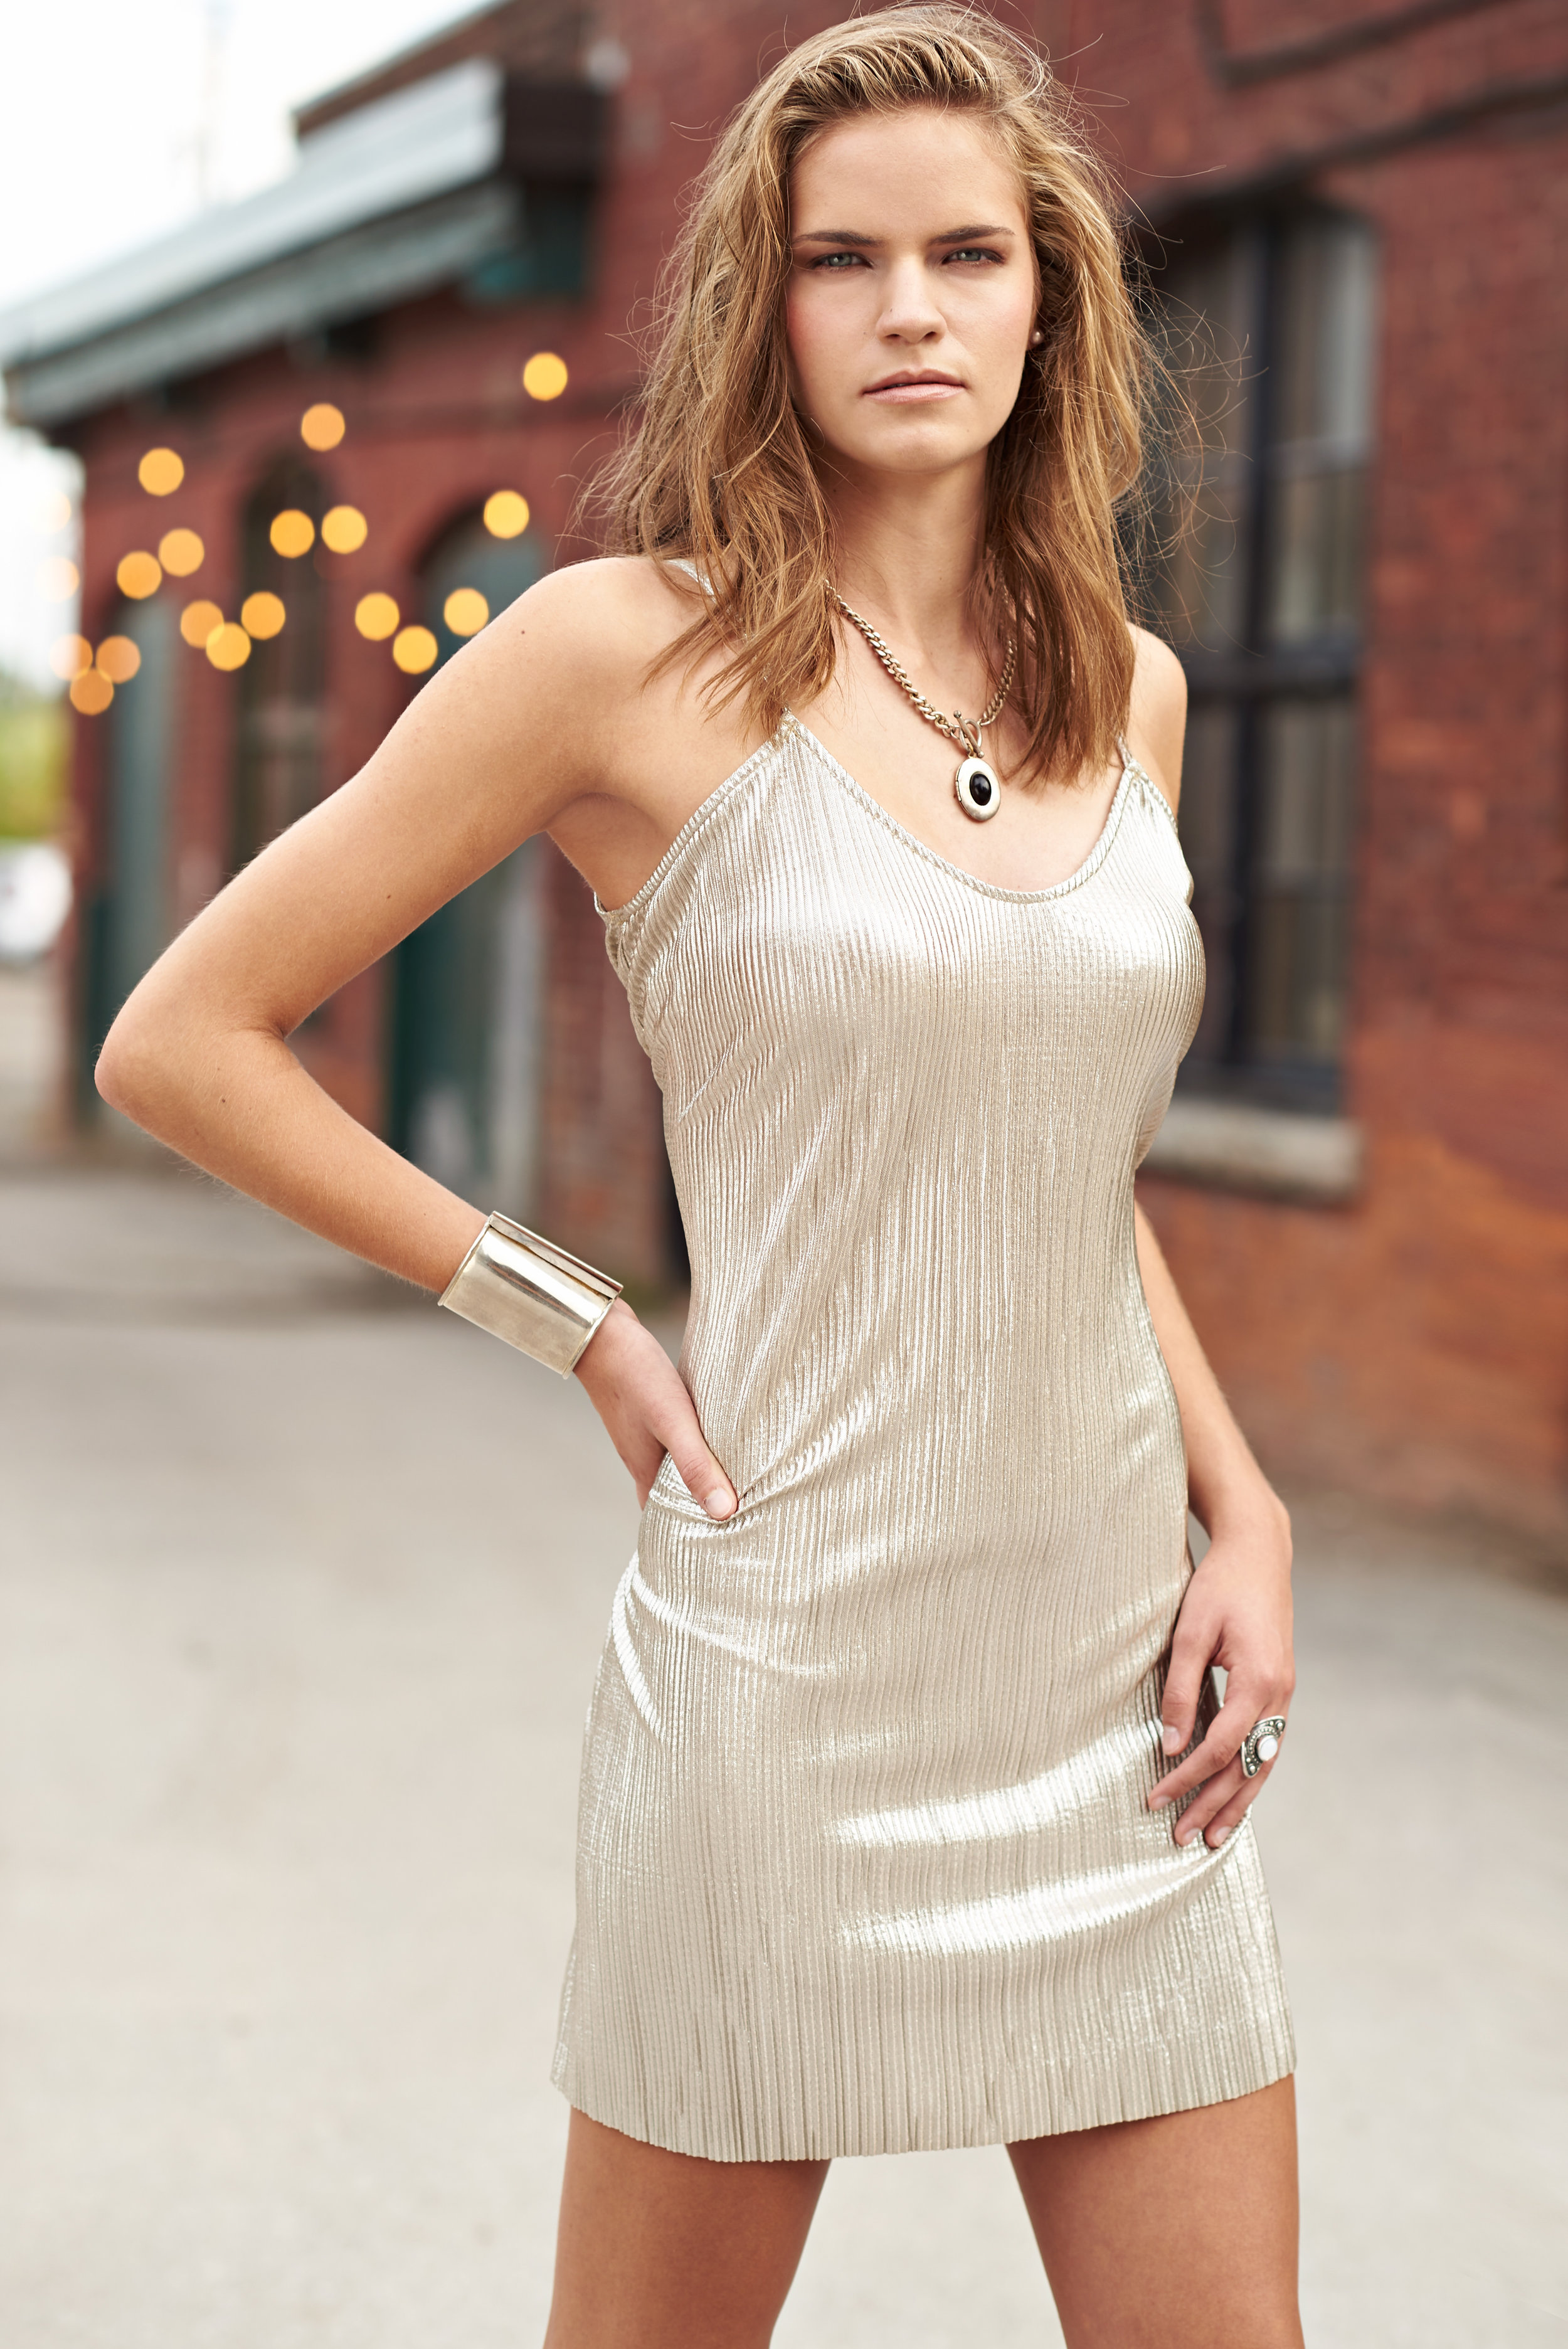 Marta-Hewson-Jacqueline-Boin-Model-Portfolio-42607.jpg